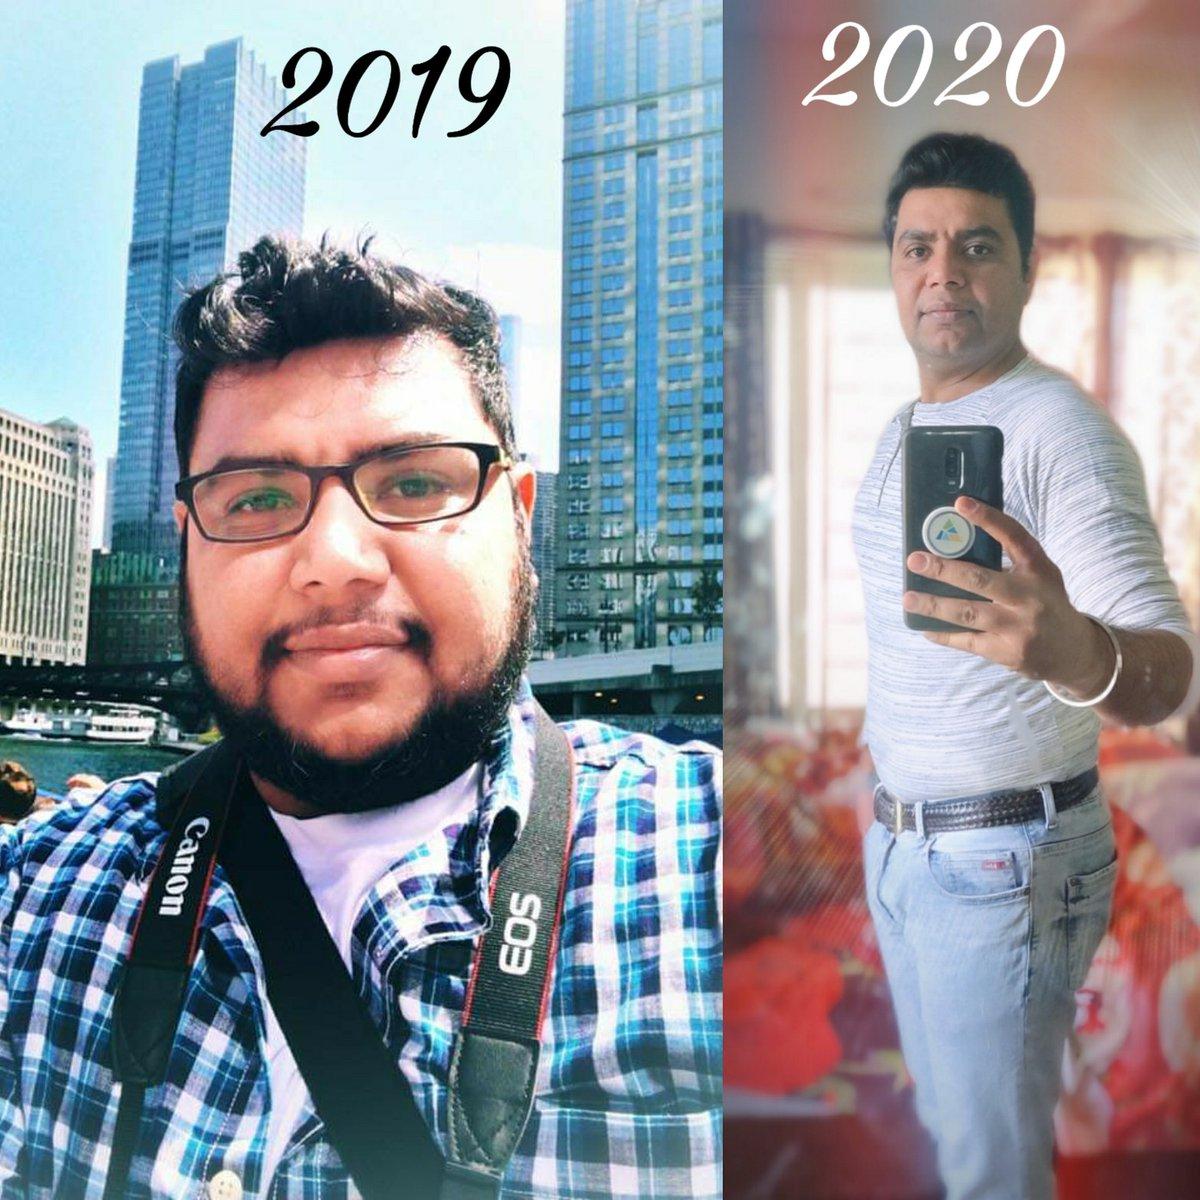 #transformation #mystory #getinspired #fitindiamovement #fitindia #yogalife #eatright #weightloss #weightlosstransformation